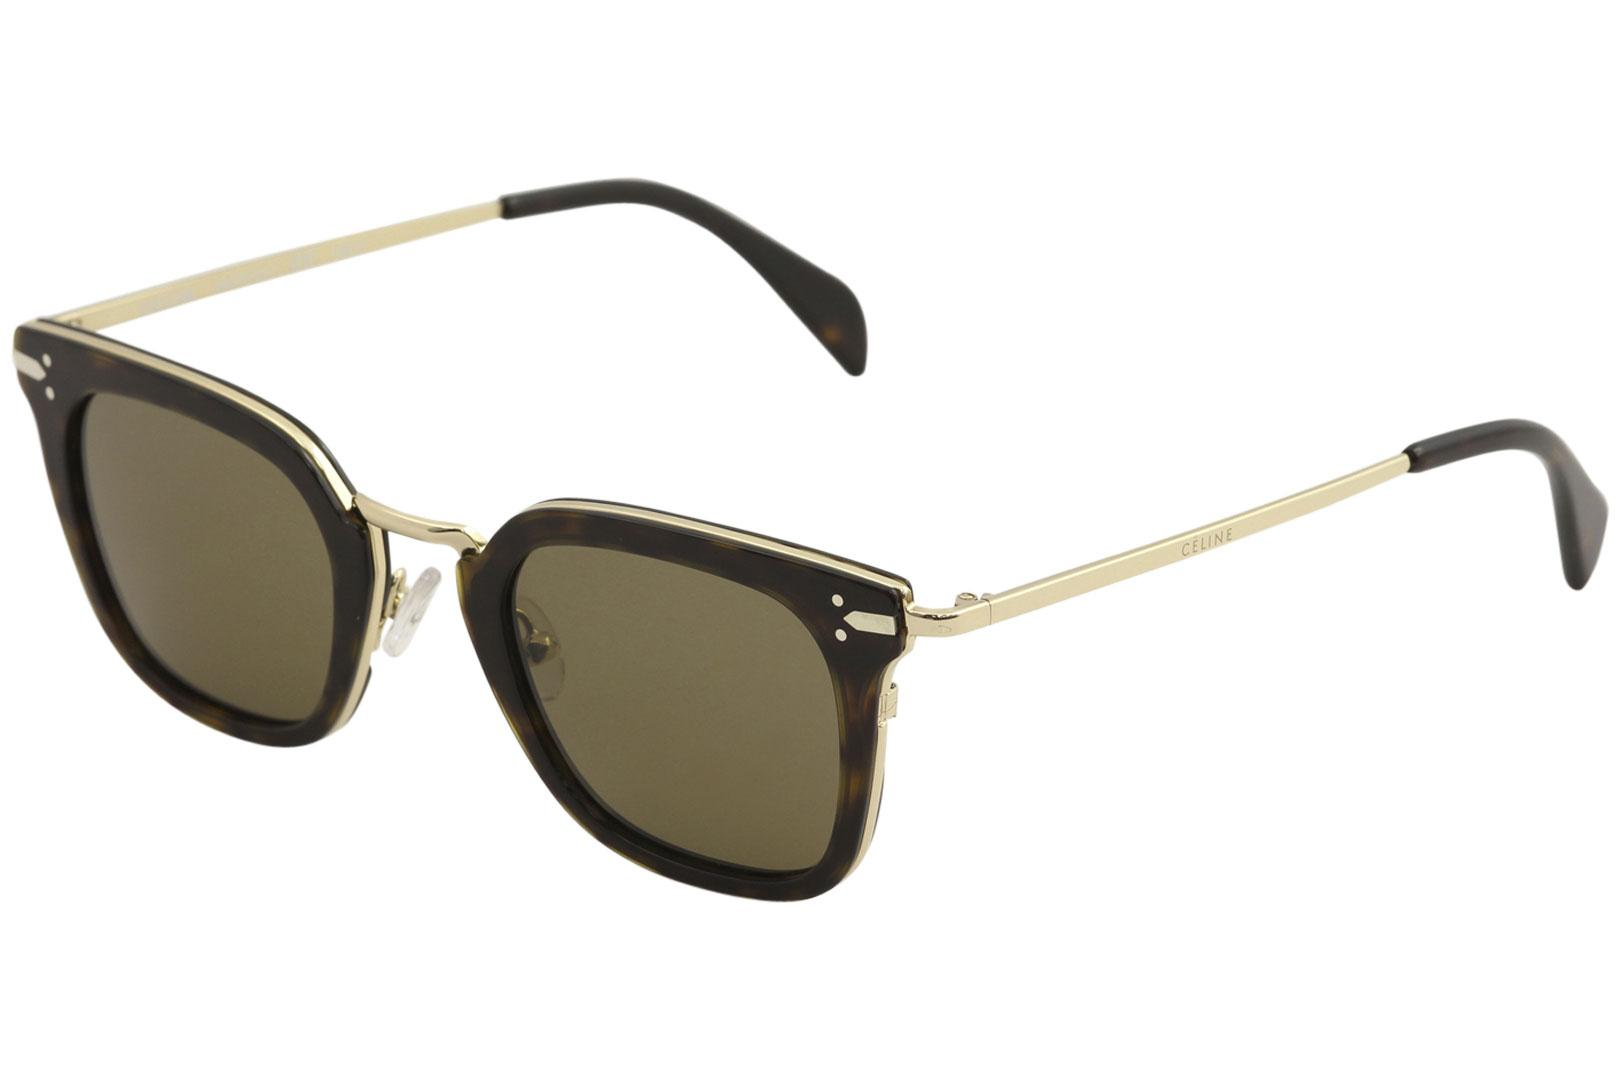 c60dfe79c3f Celine Women s CL 41402S 41402 S Fashion Square Sunglasses